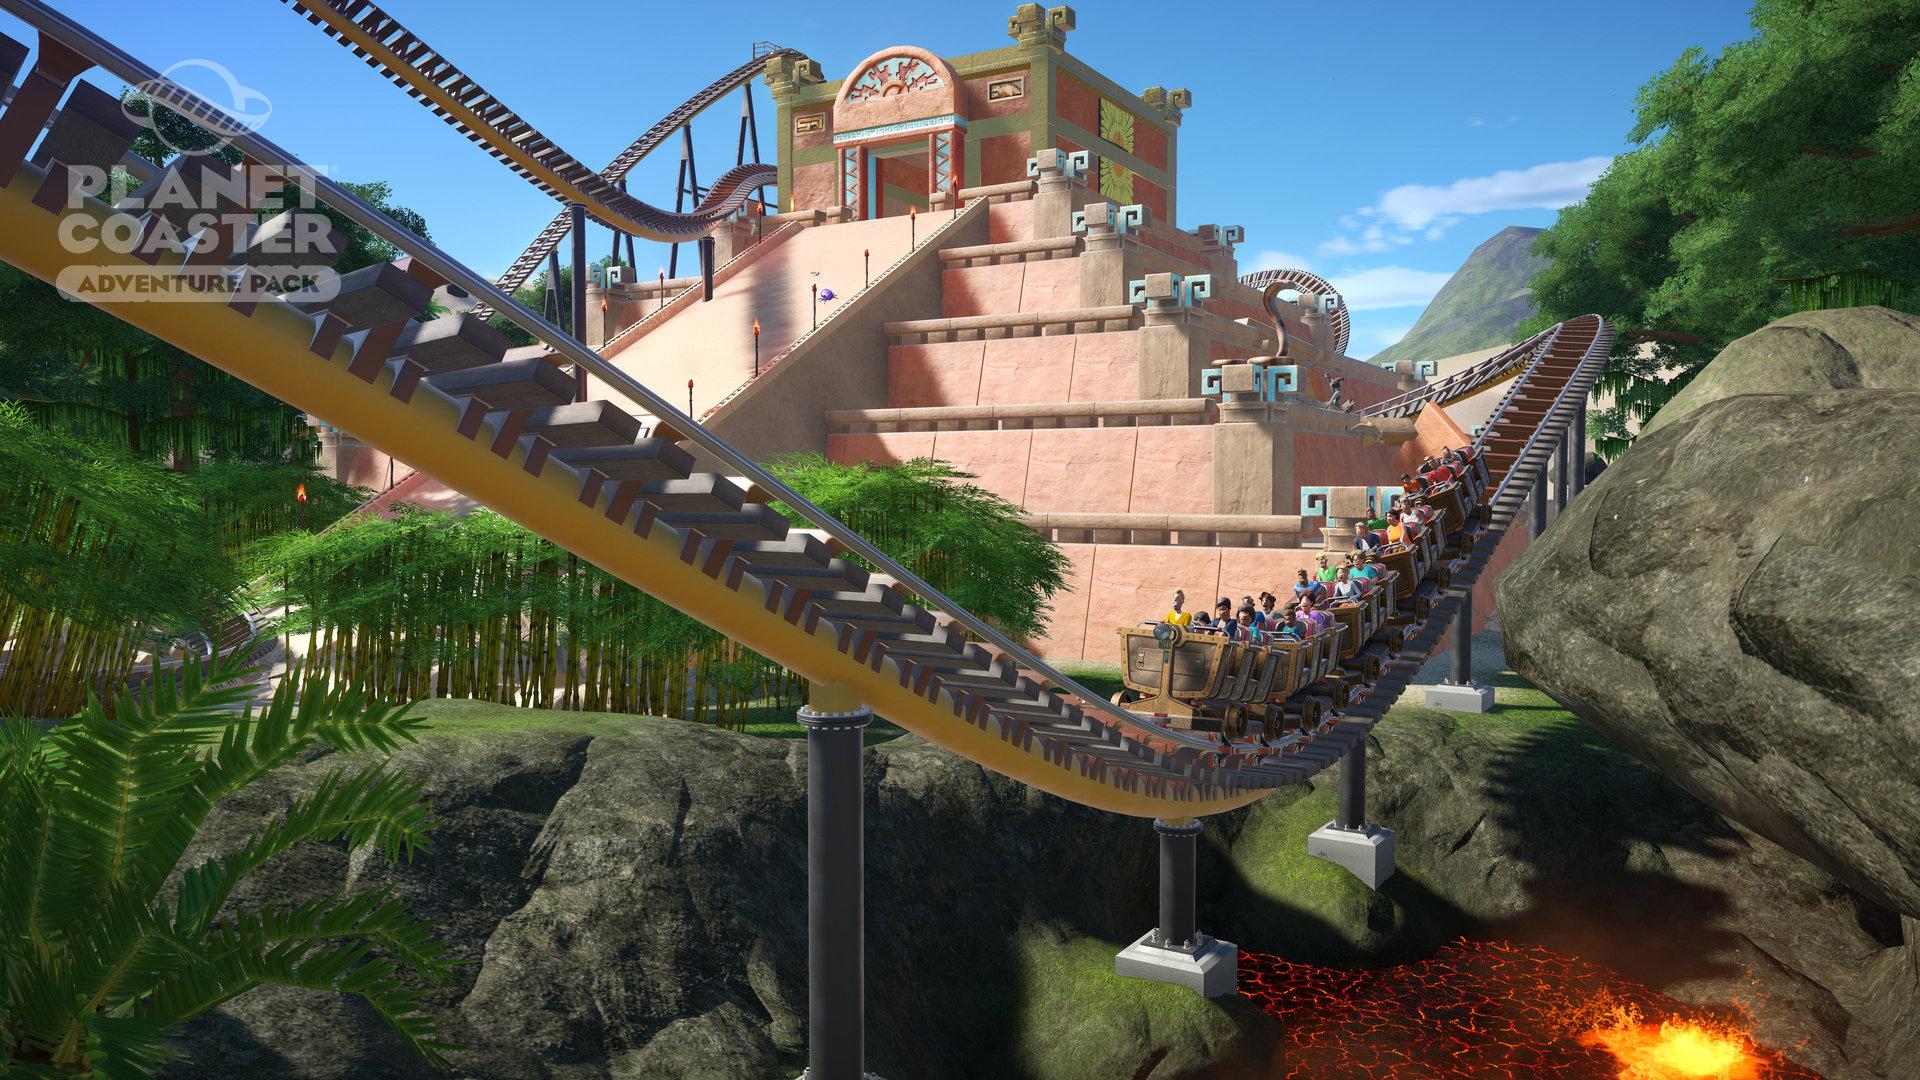 Planet Coaster - Adventure Pack screenshot